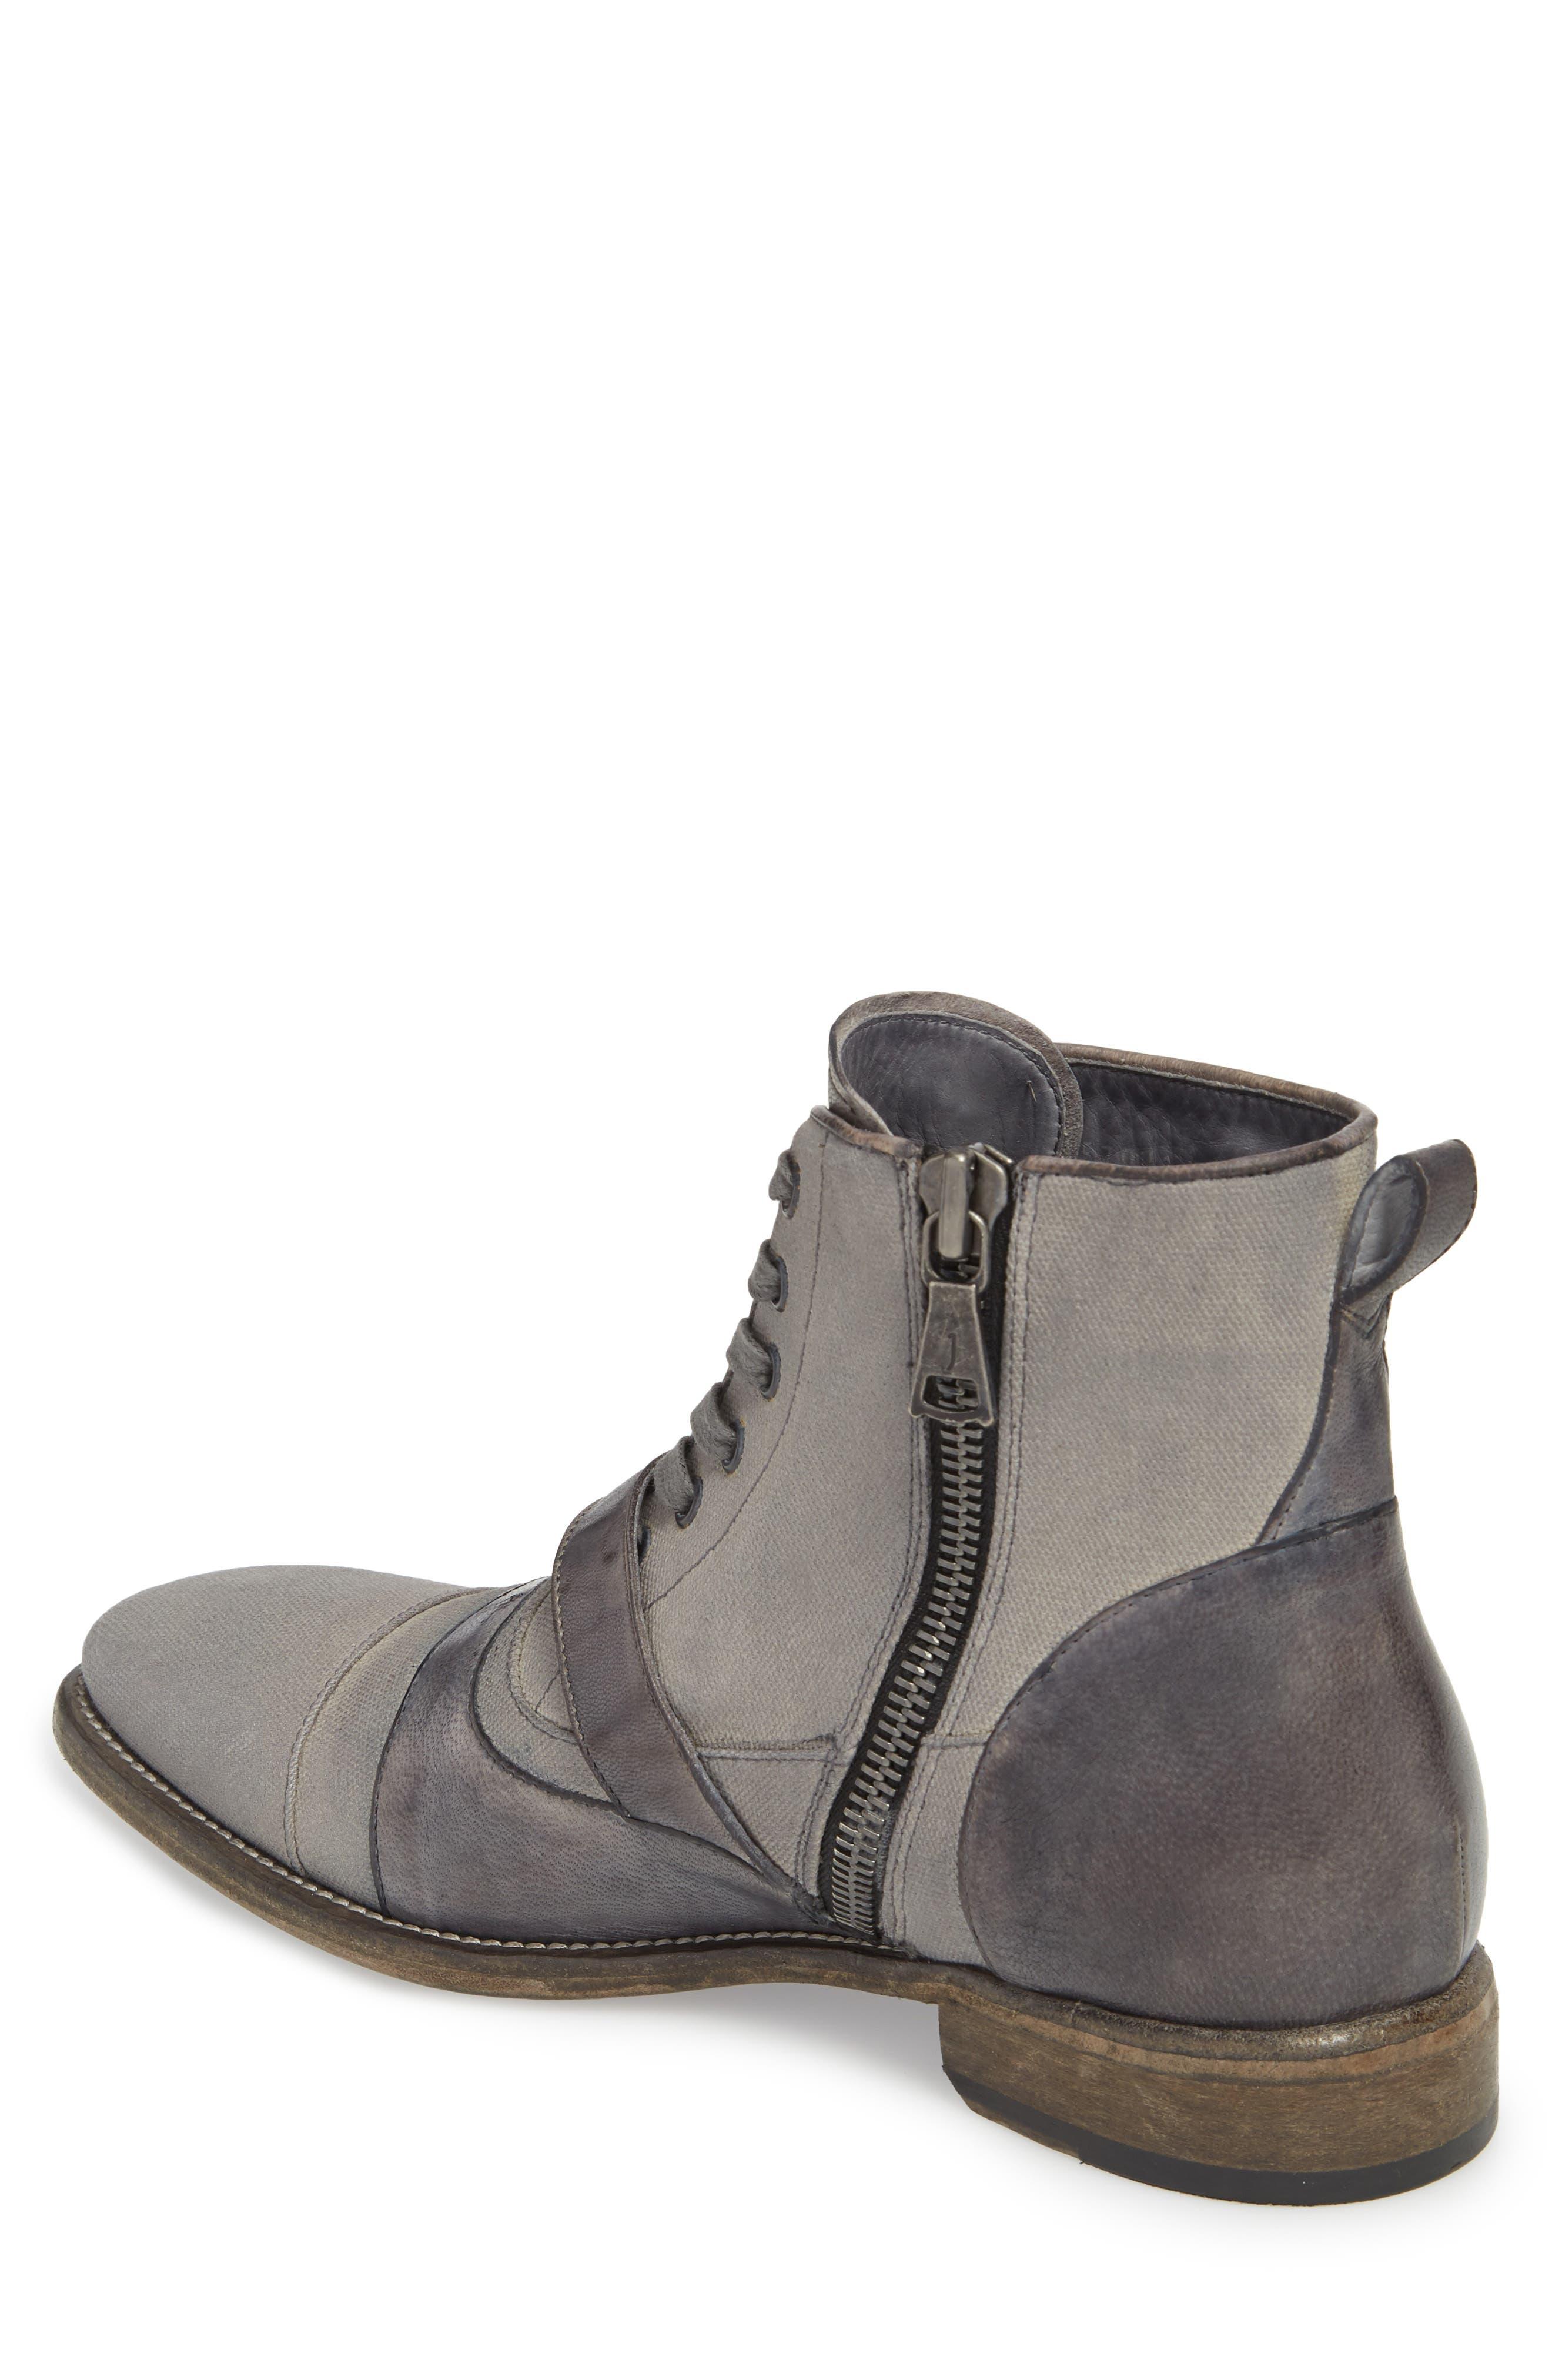 John Varvatos Fleetwood Buckle Cricket Boot,                             Alternate thumbnail 2, color,                             Lead Canvas/ Leather